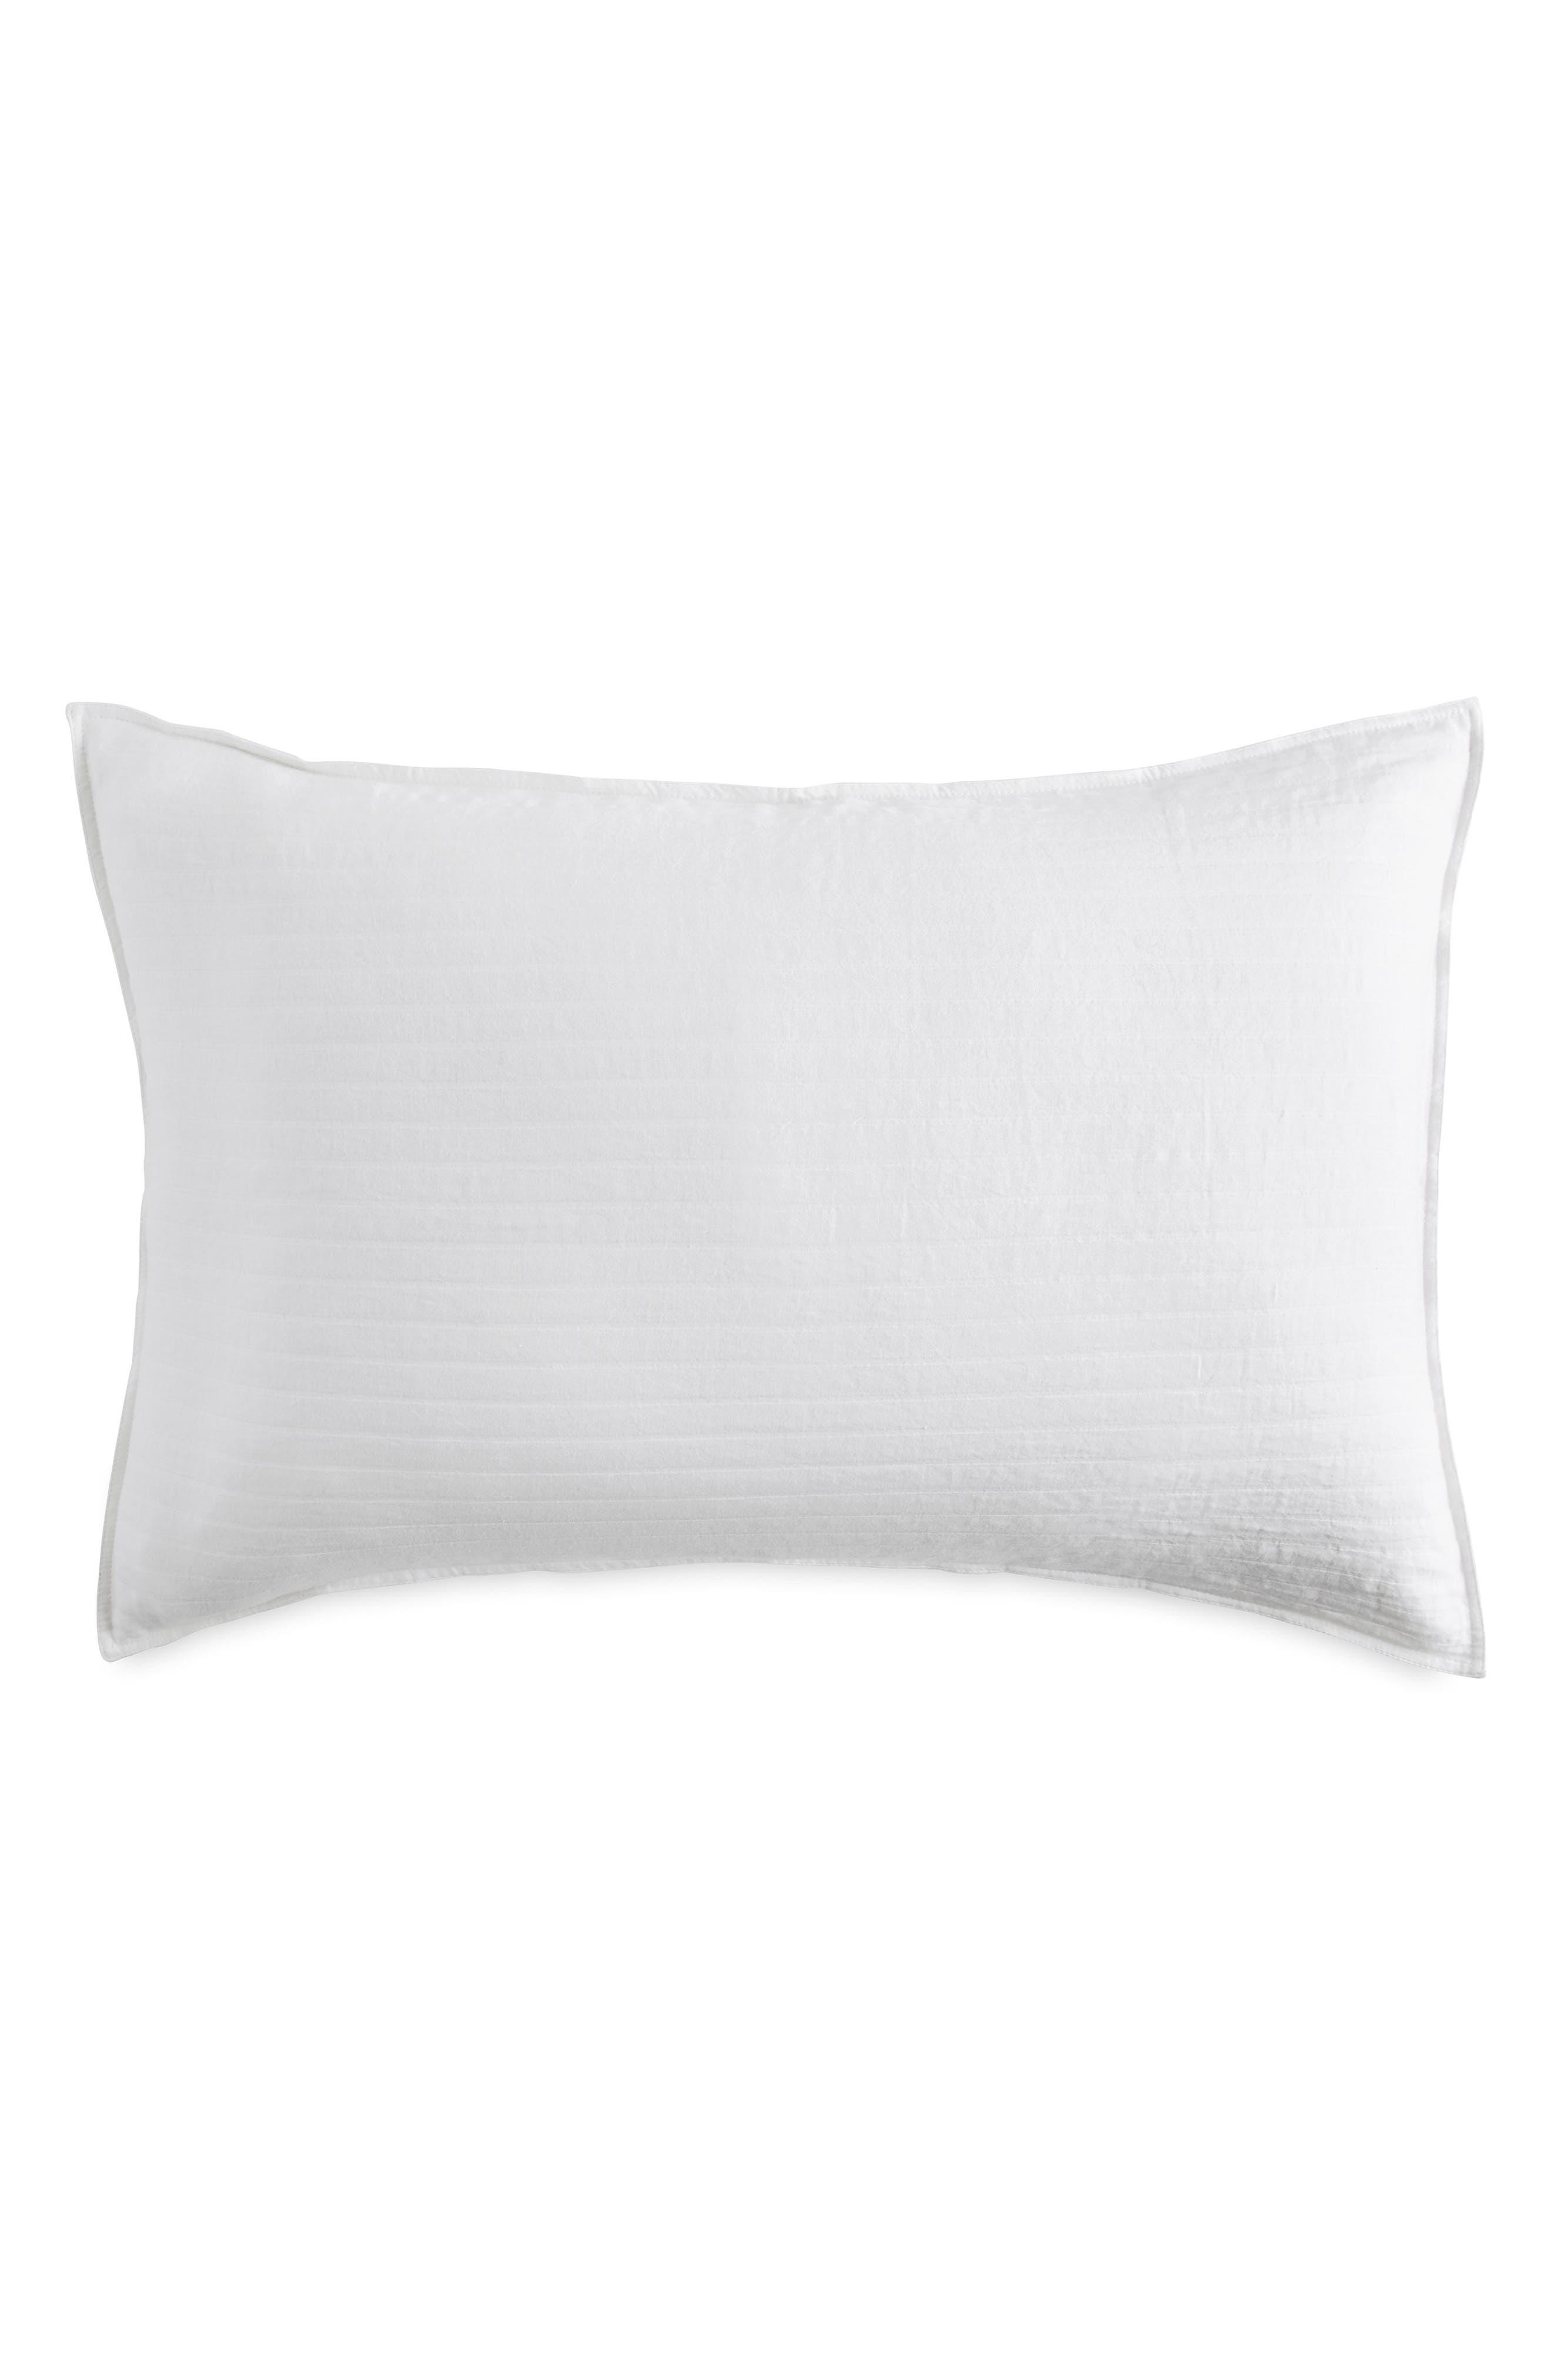 PURE Comfy White Pillow Sham,                         Main,                         color, WHITE